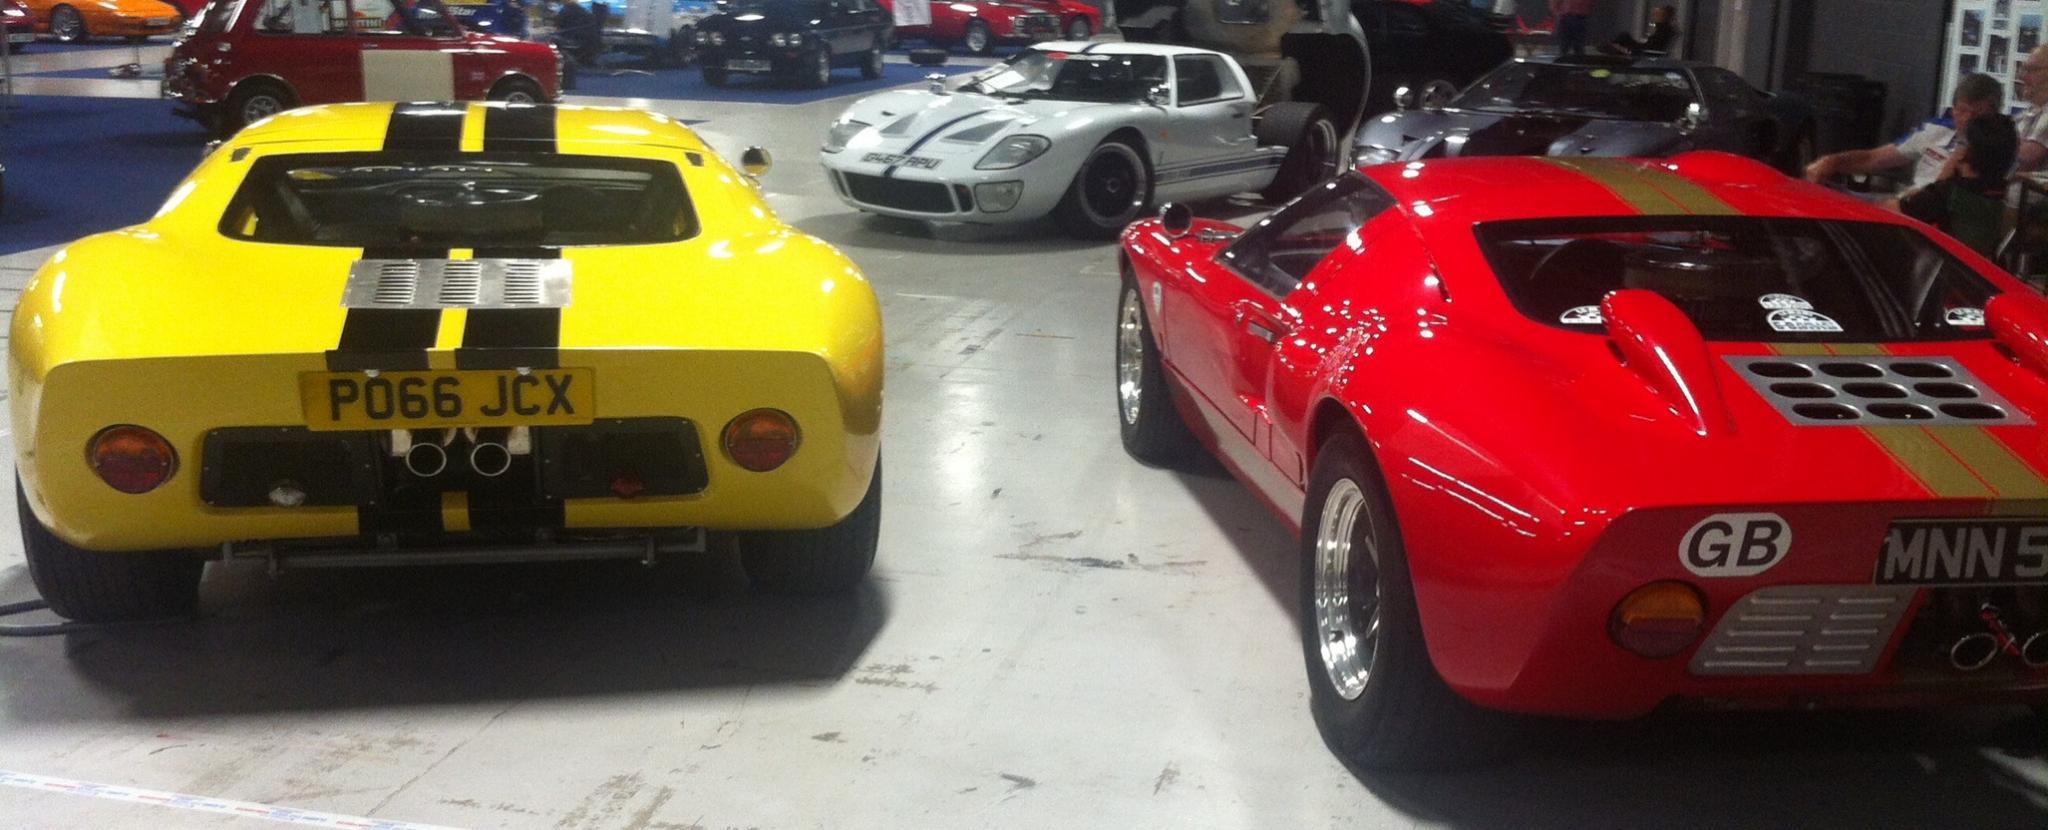 F J Classic car show Manchester.-image-jpg